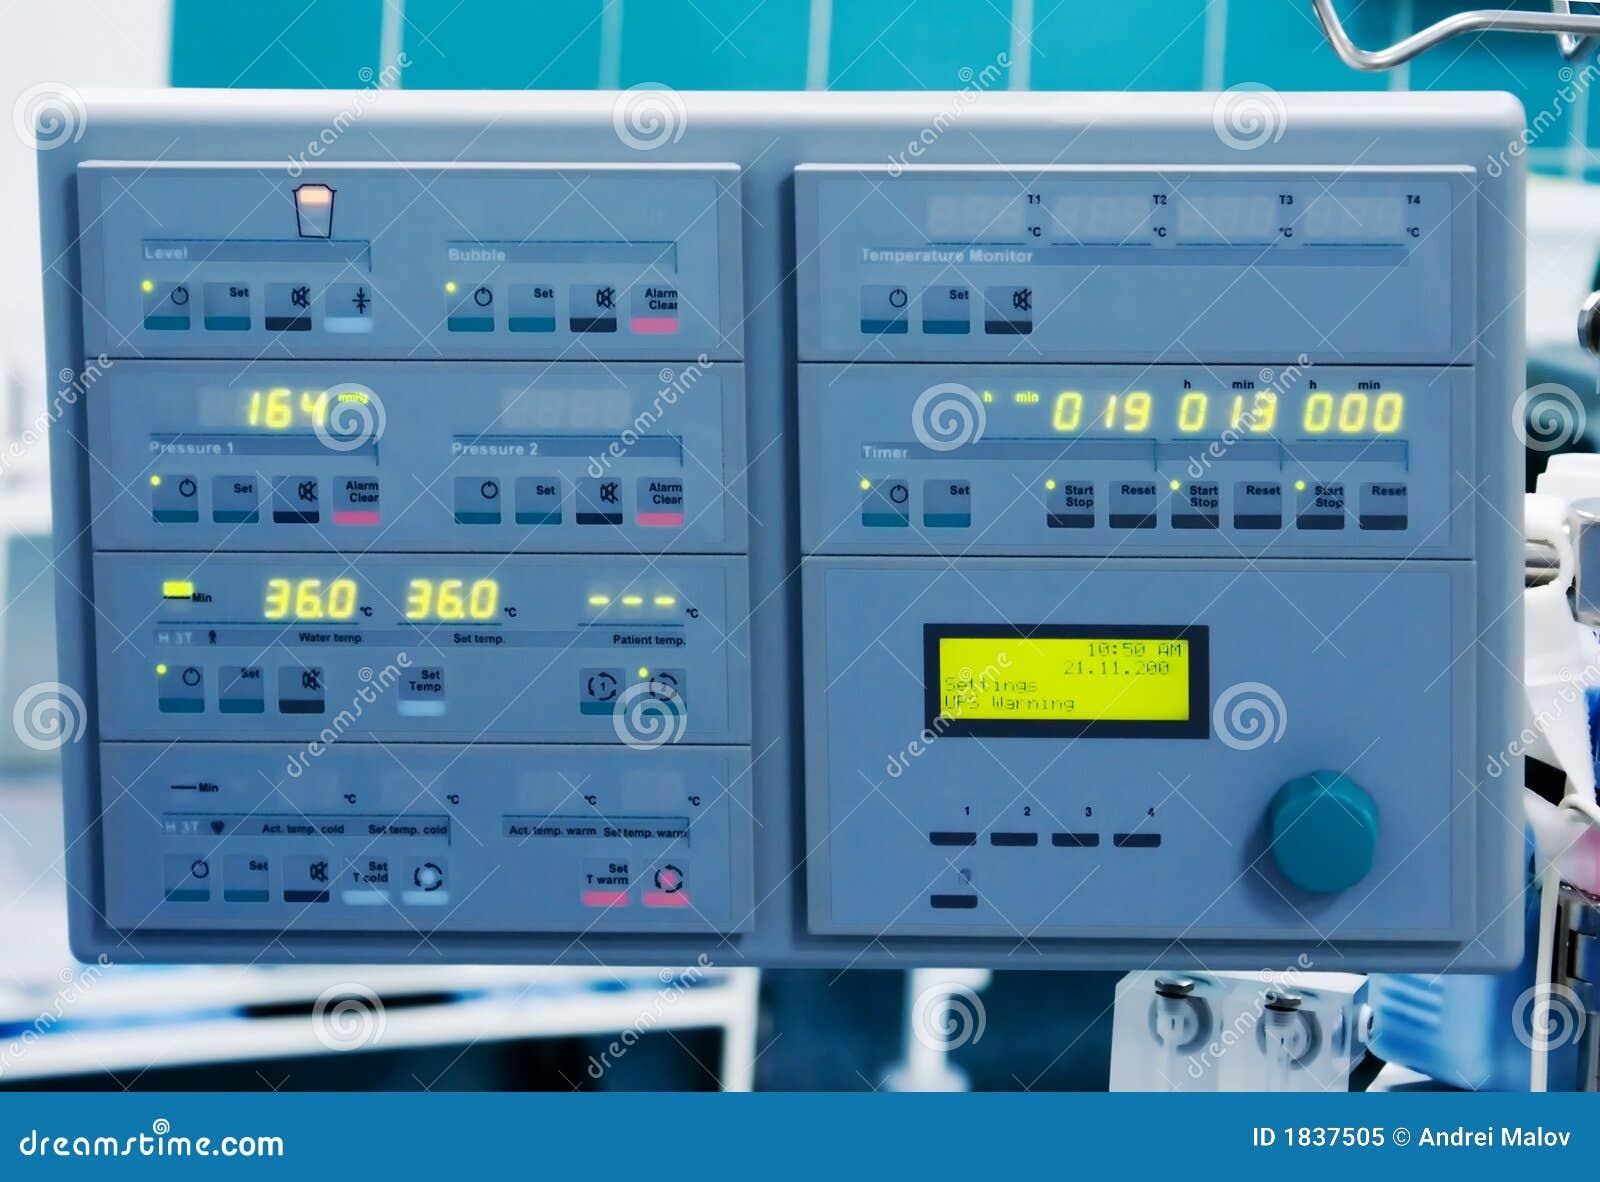 cardiac bypass machine